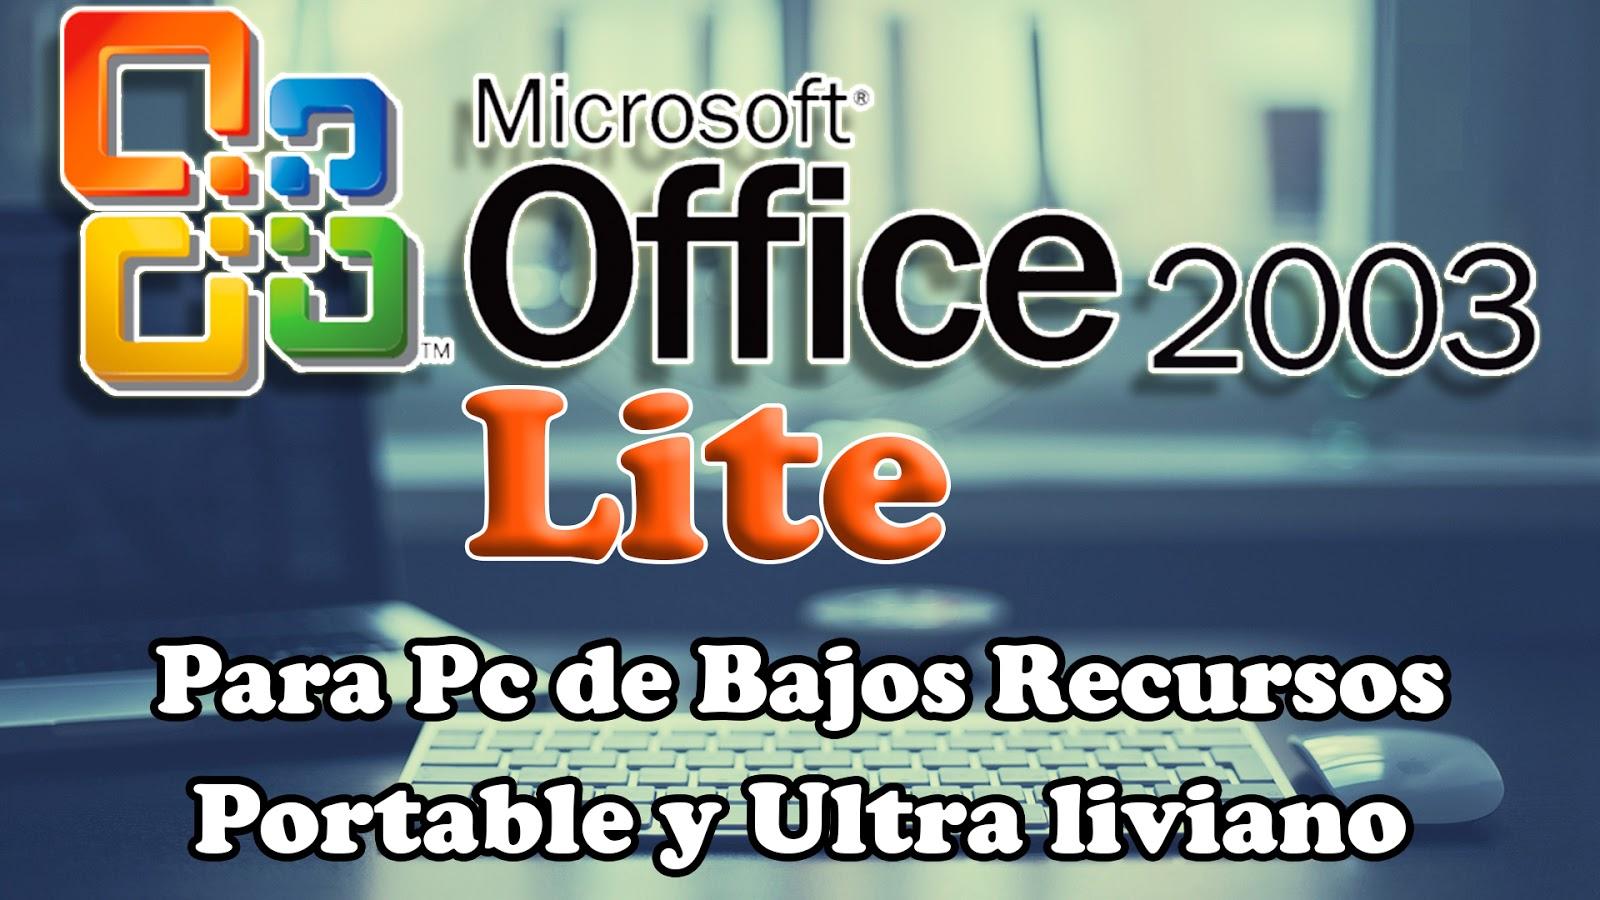 Microsoft Office 2003 Lite Portable | Programas y Utilidades PC